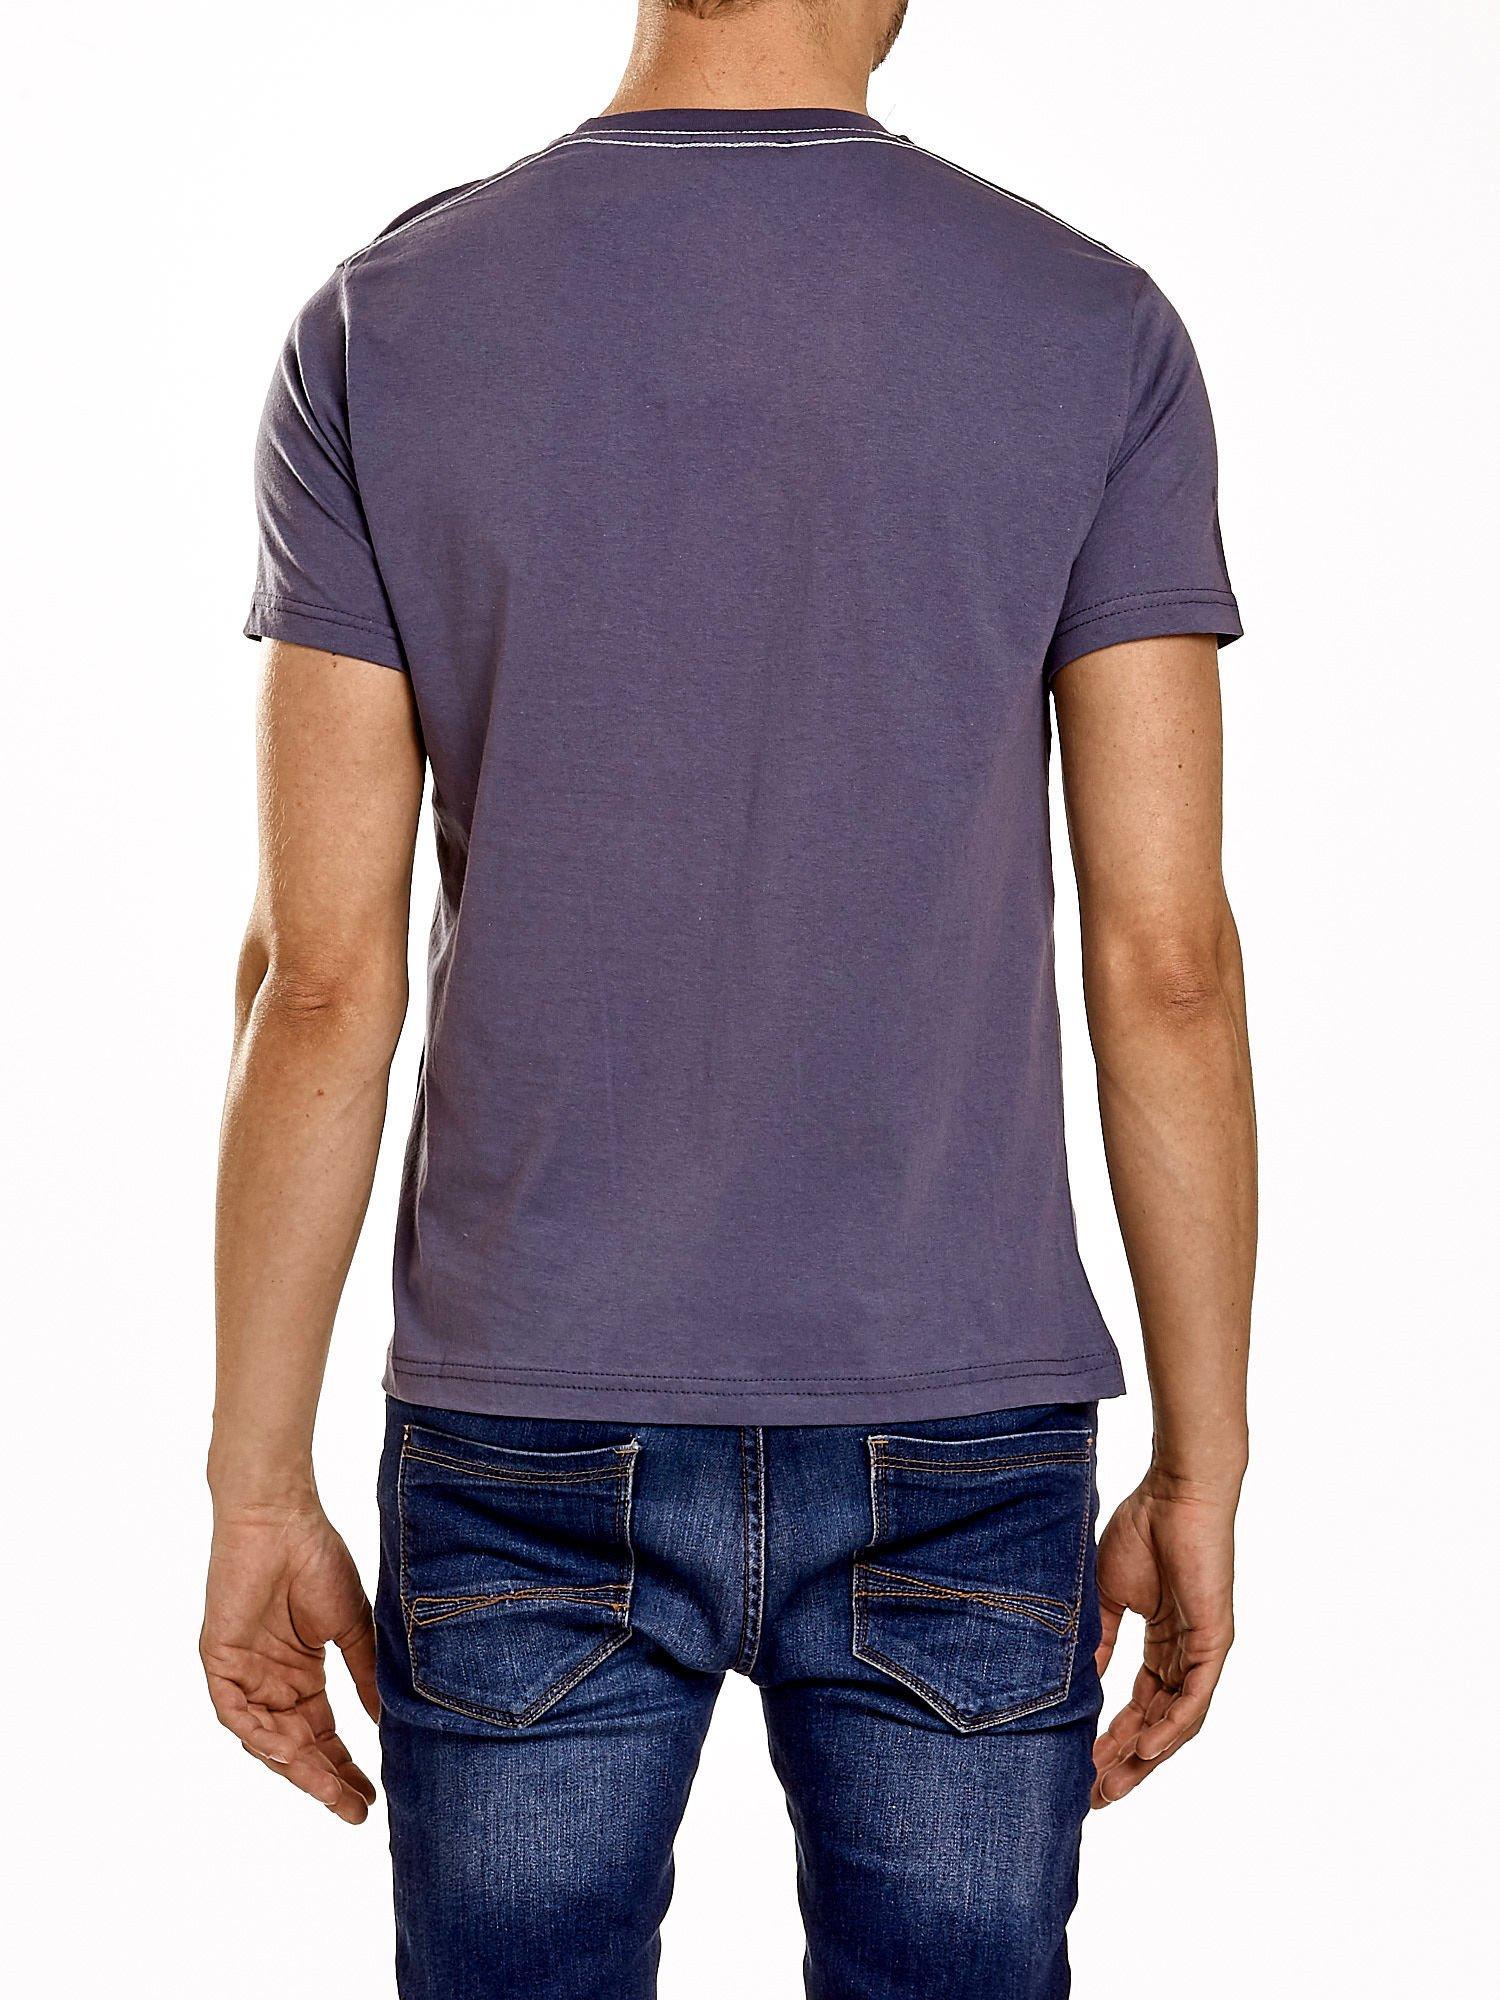 Ciemnoszary t-shirt męski z napisem BROOKLYN ATHLETIC UNIVERSITY                                  zdj.                                  5